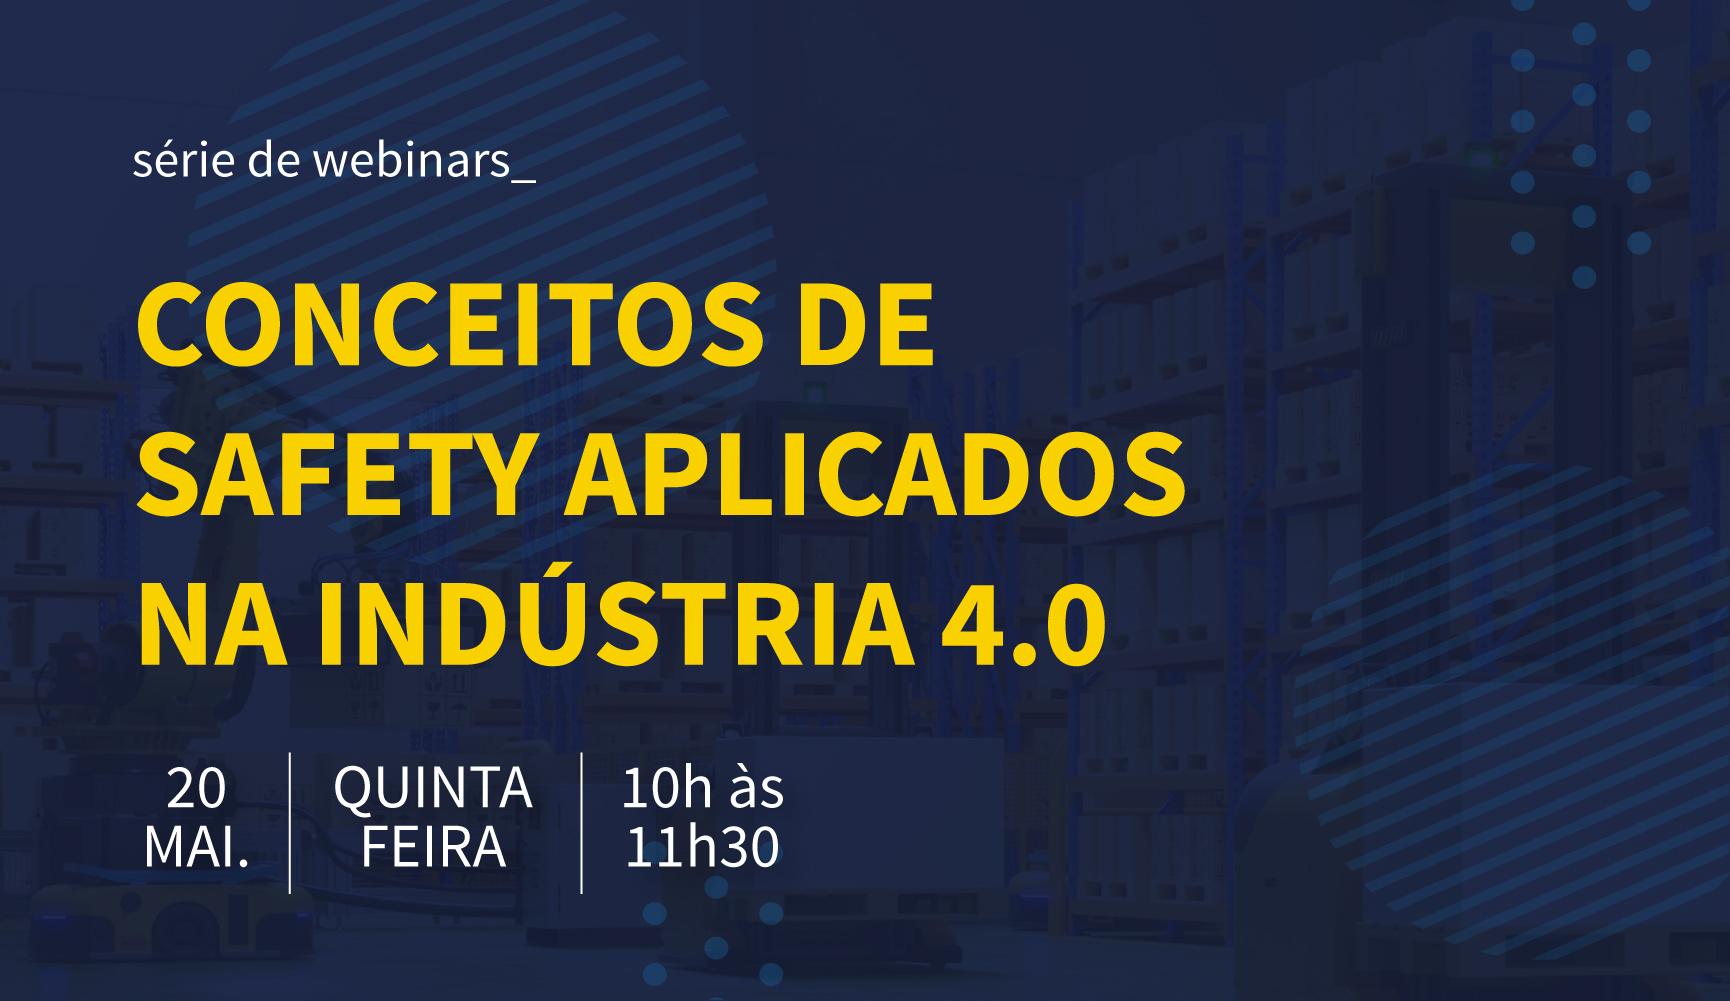 Conceitos de Safety aplicados na Indústria 4.0